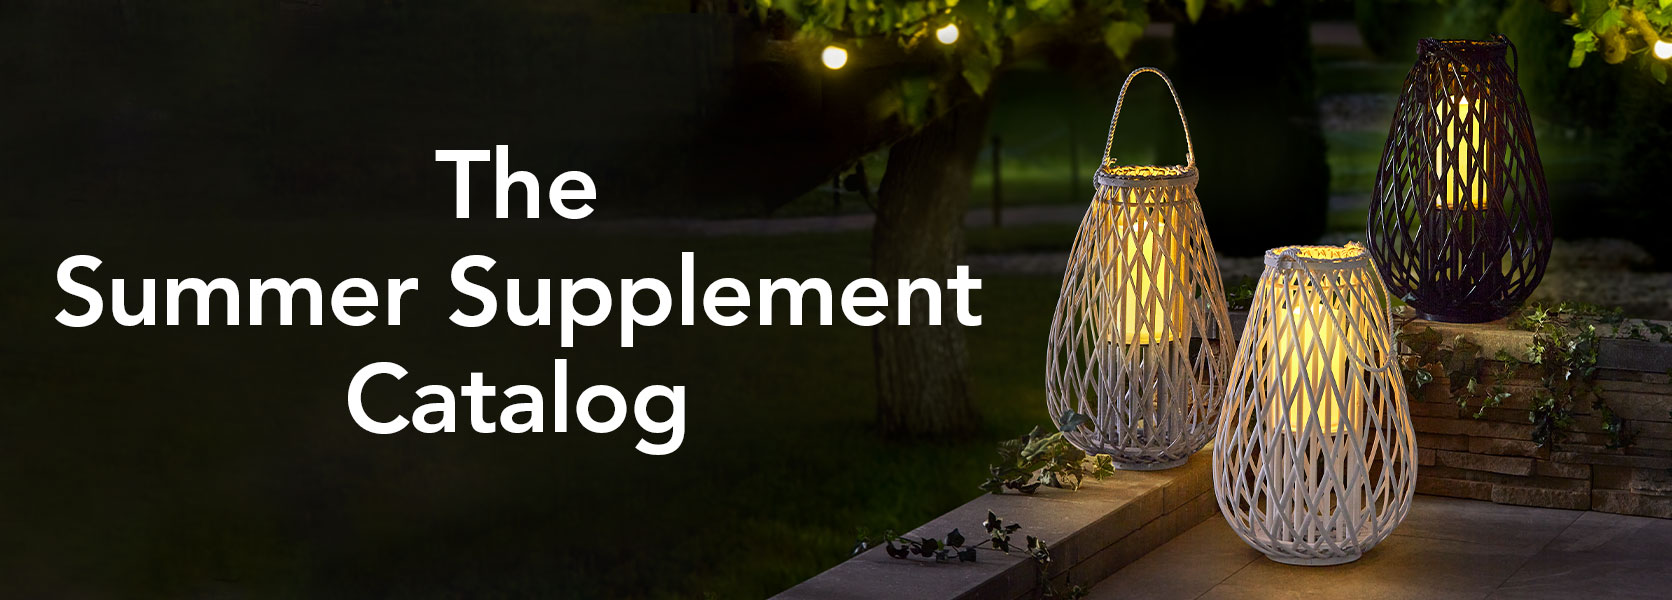 The Solar Candle Wicker Lantern